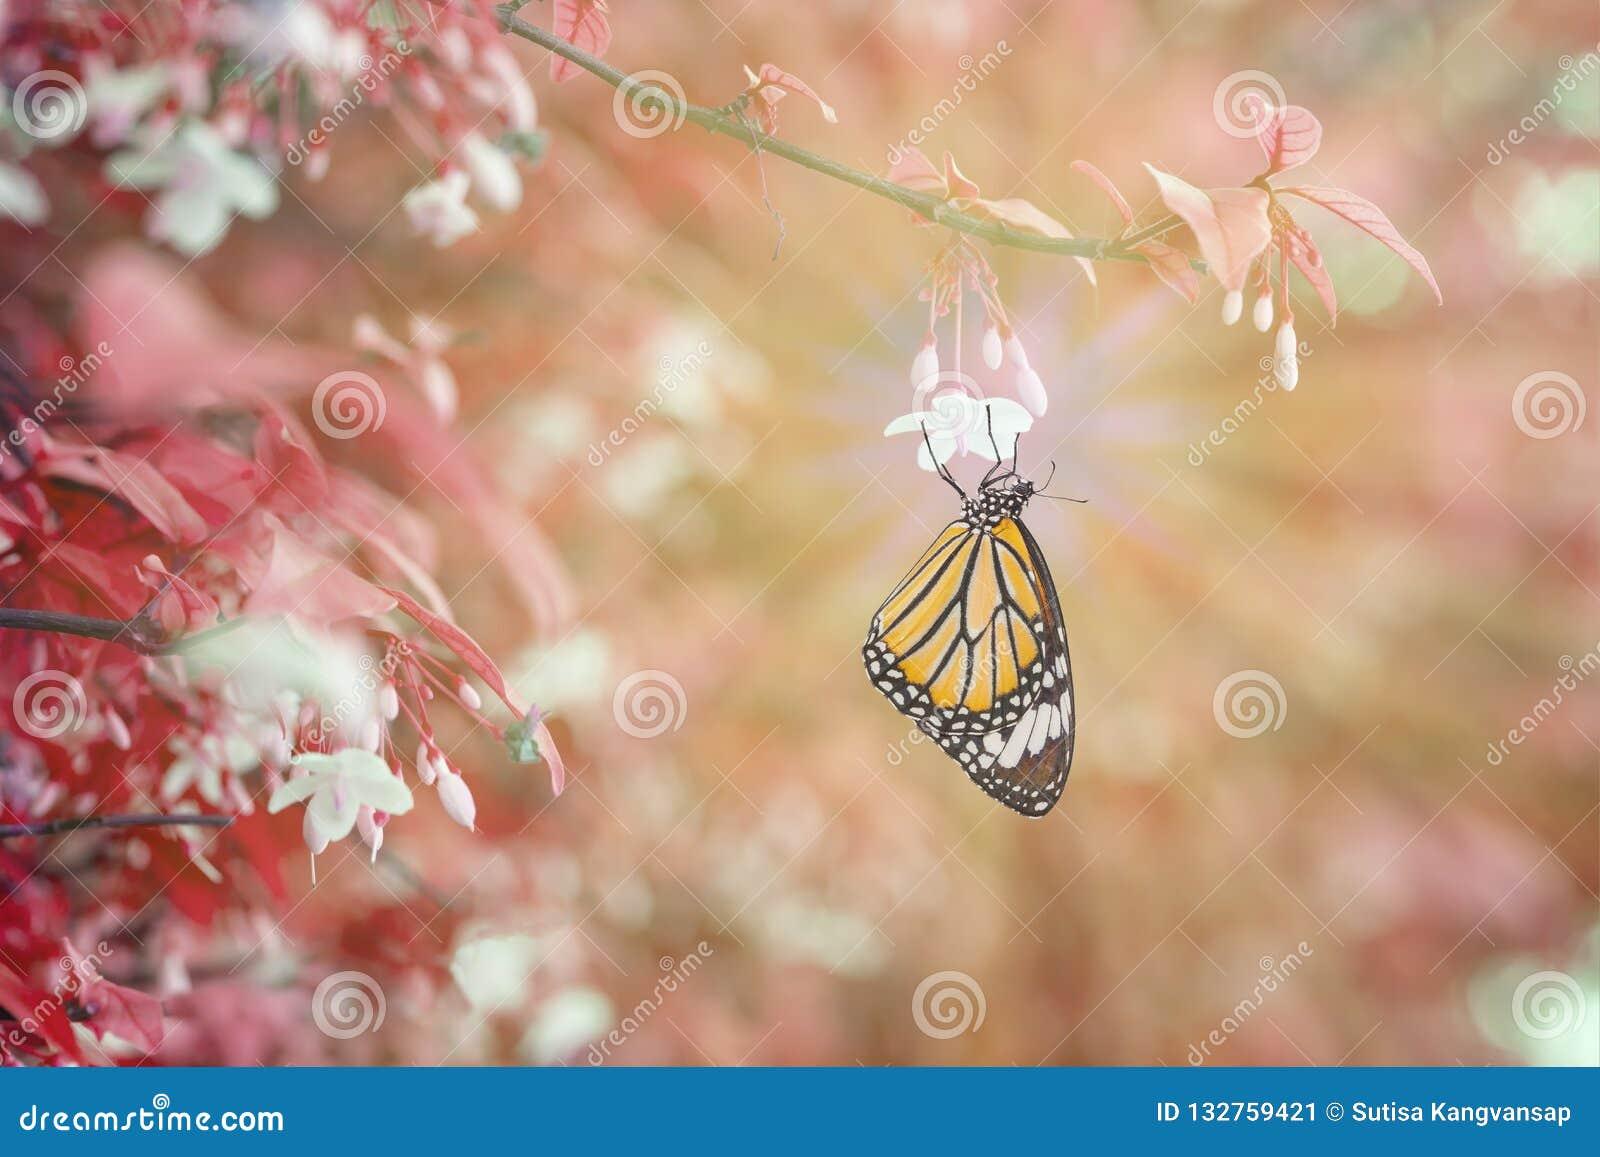 Mariposa común del tigre que descansa sobre la flor blanca